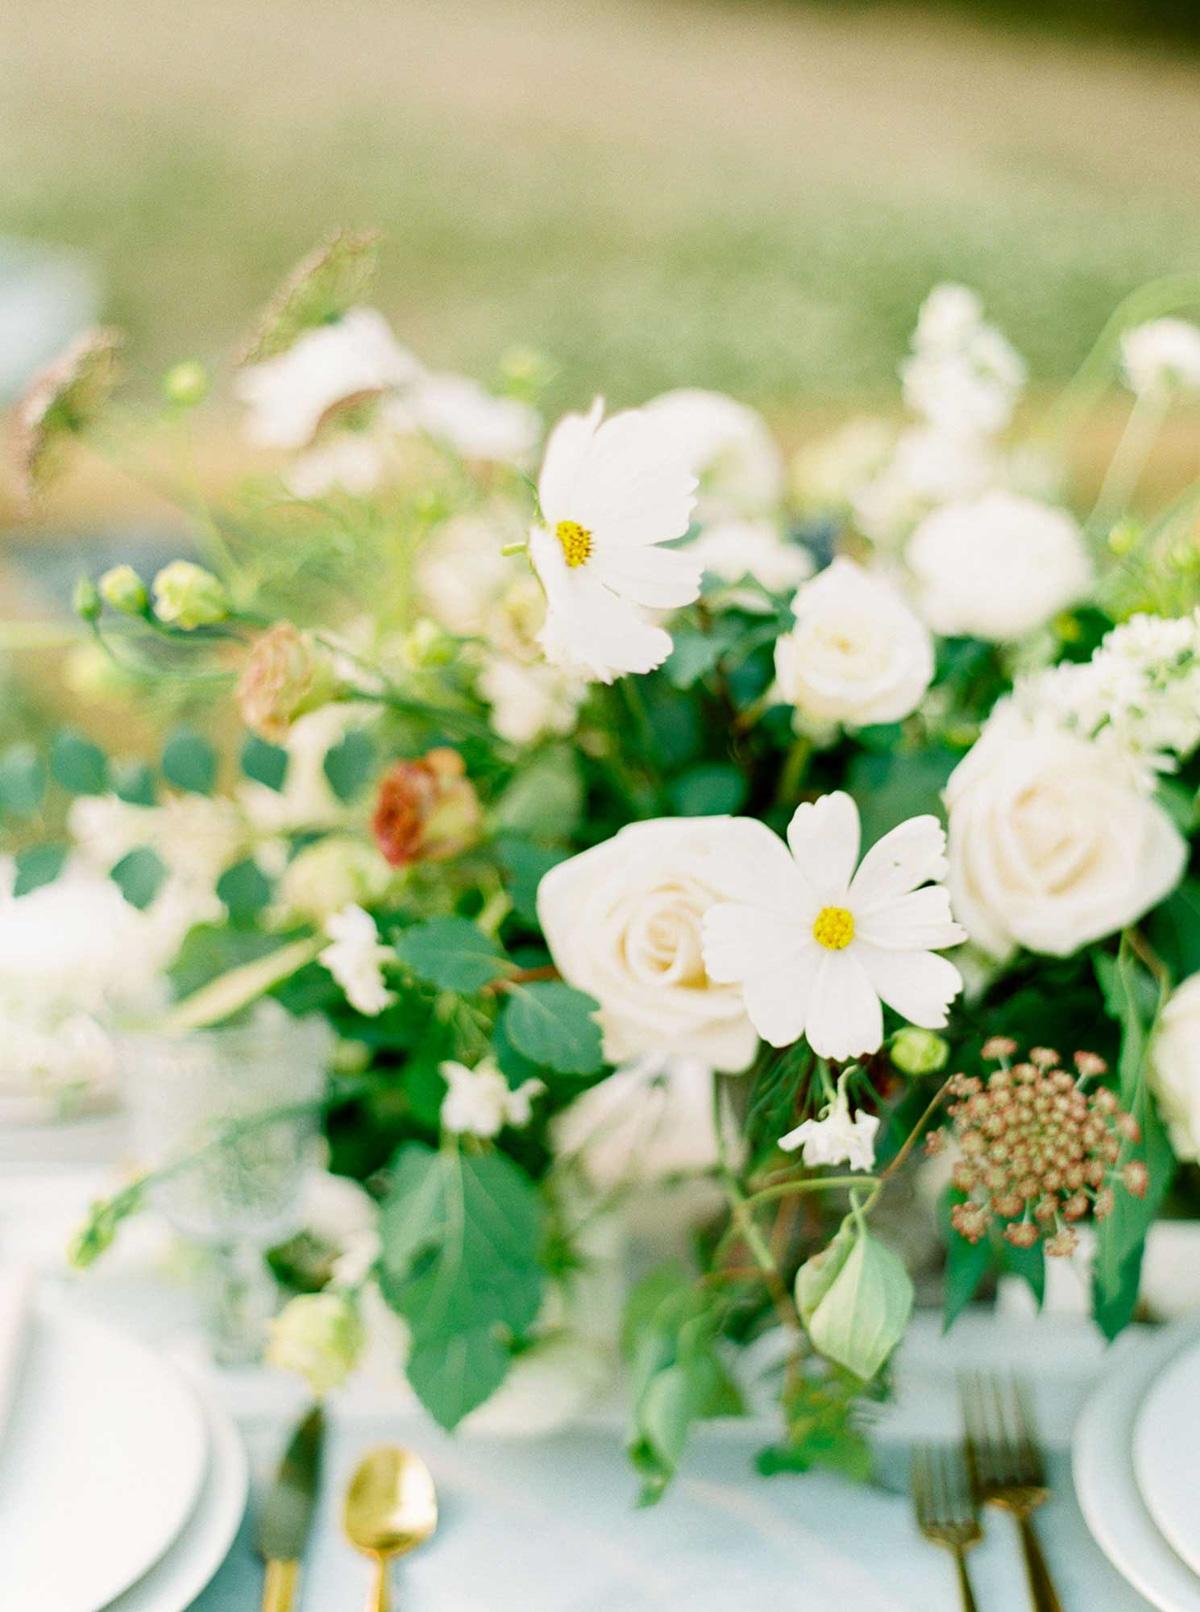 kayla-yestal-vineyard-bride-swish-list-woodland-weddings-niagara-wedding-editorial-58.jpg